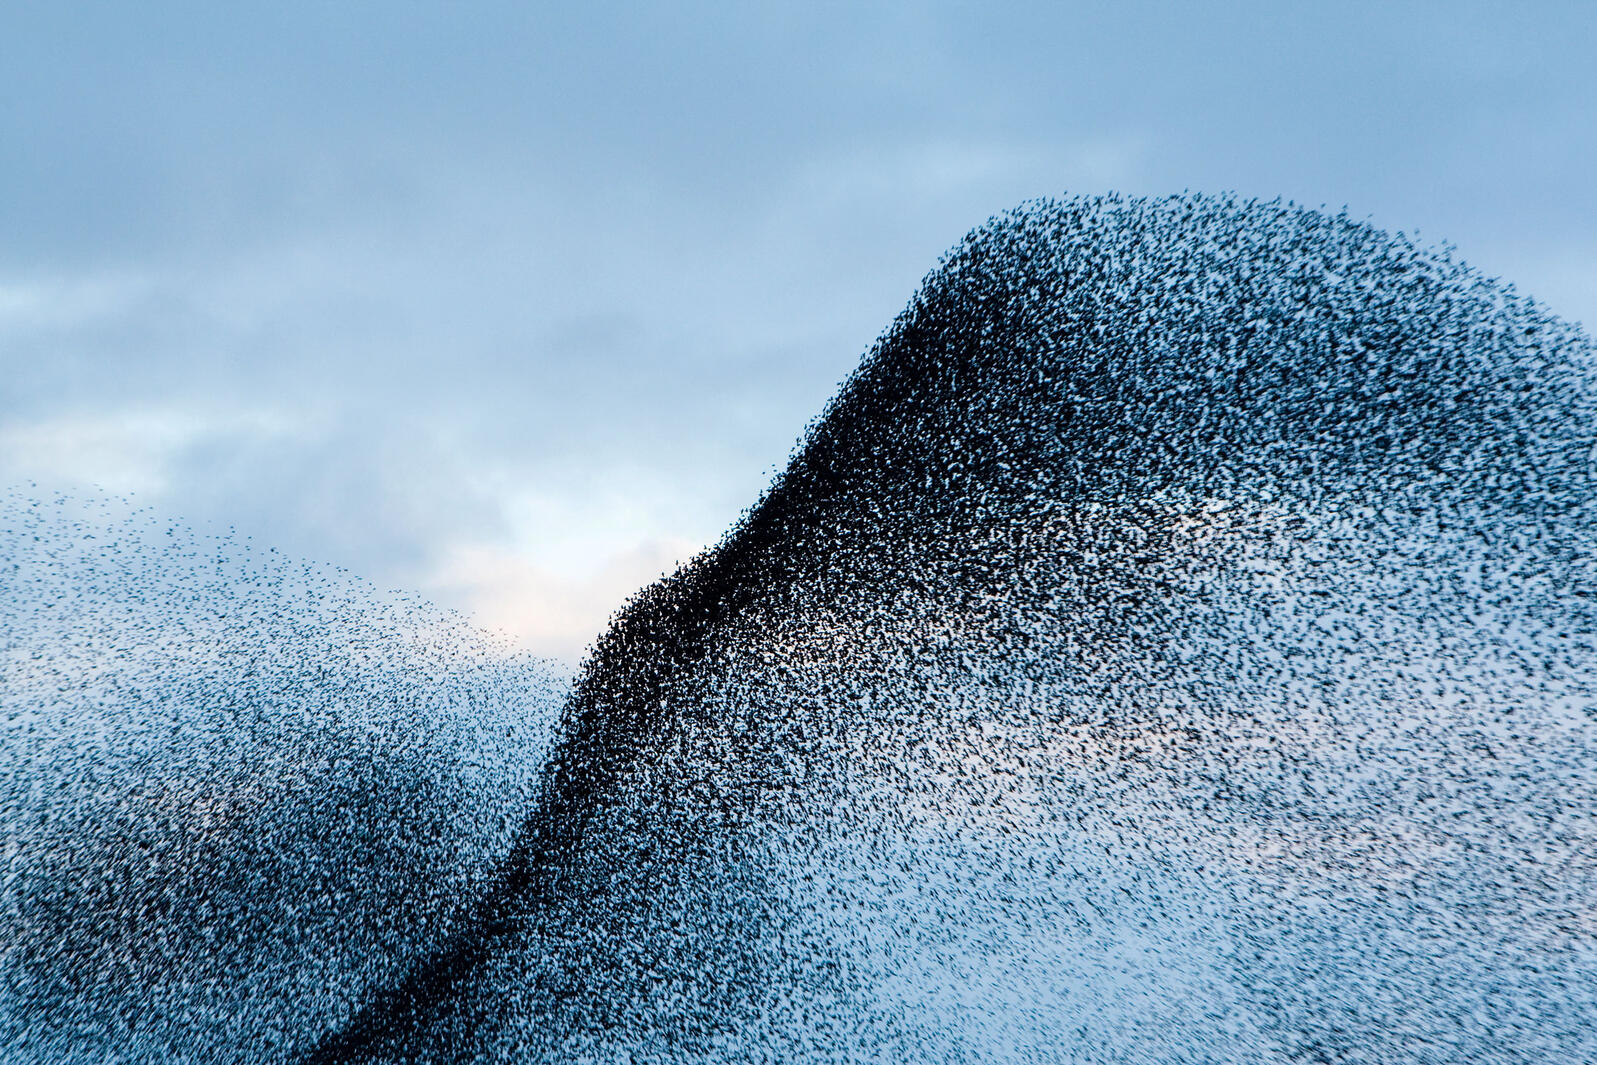 European Starlings. Mark Bretherton/Alamy